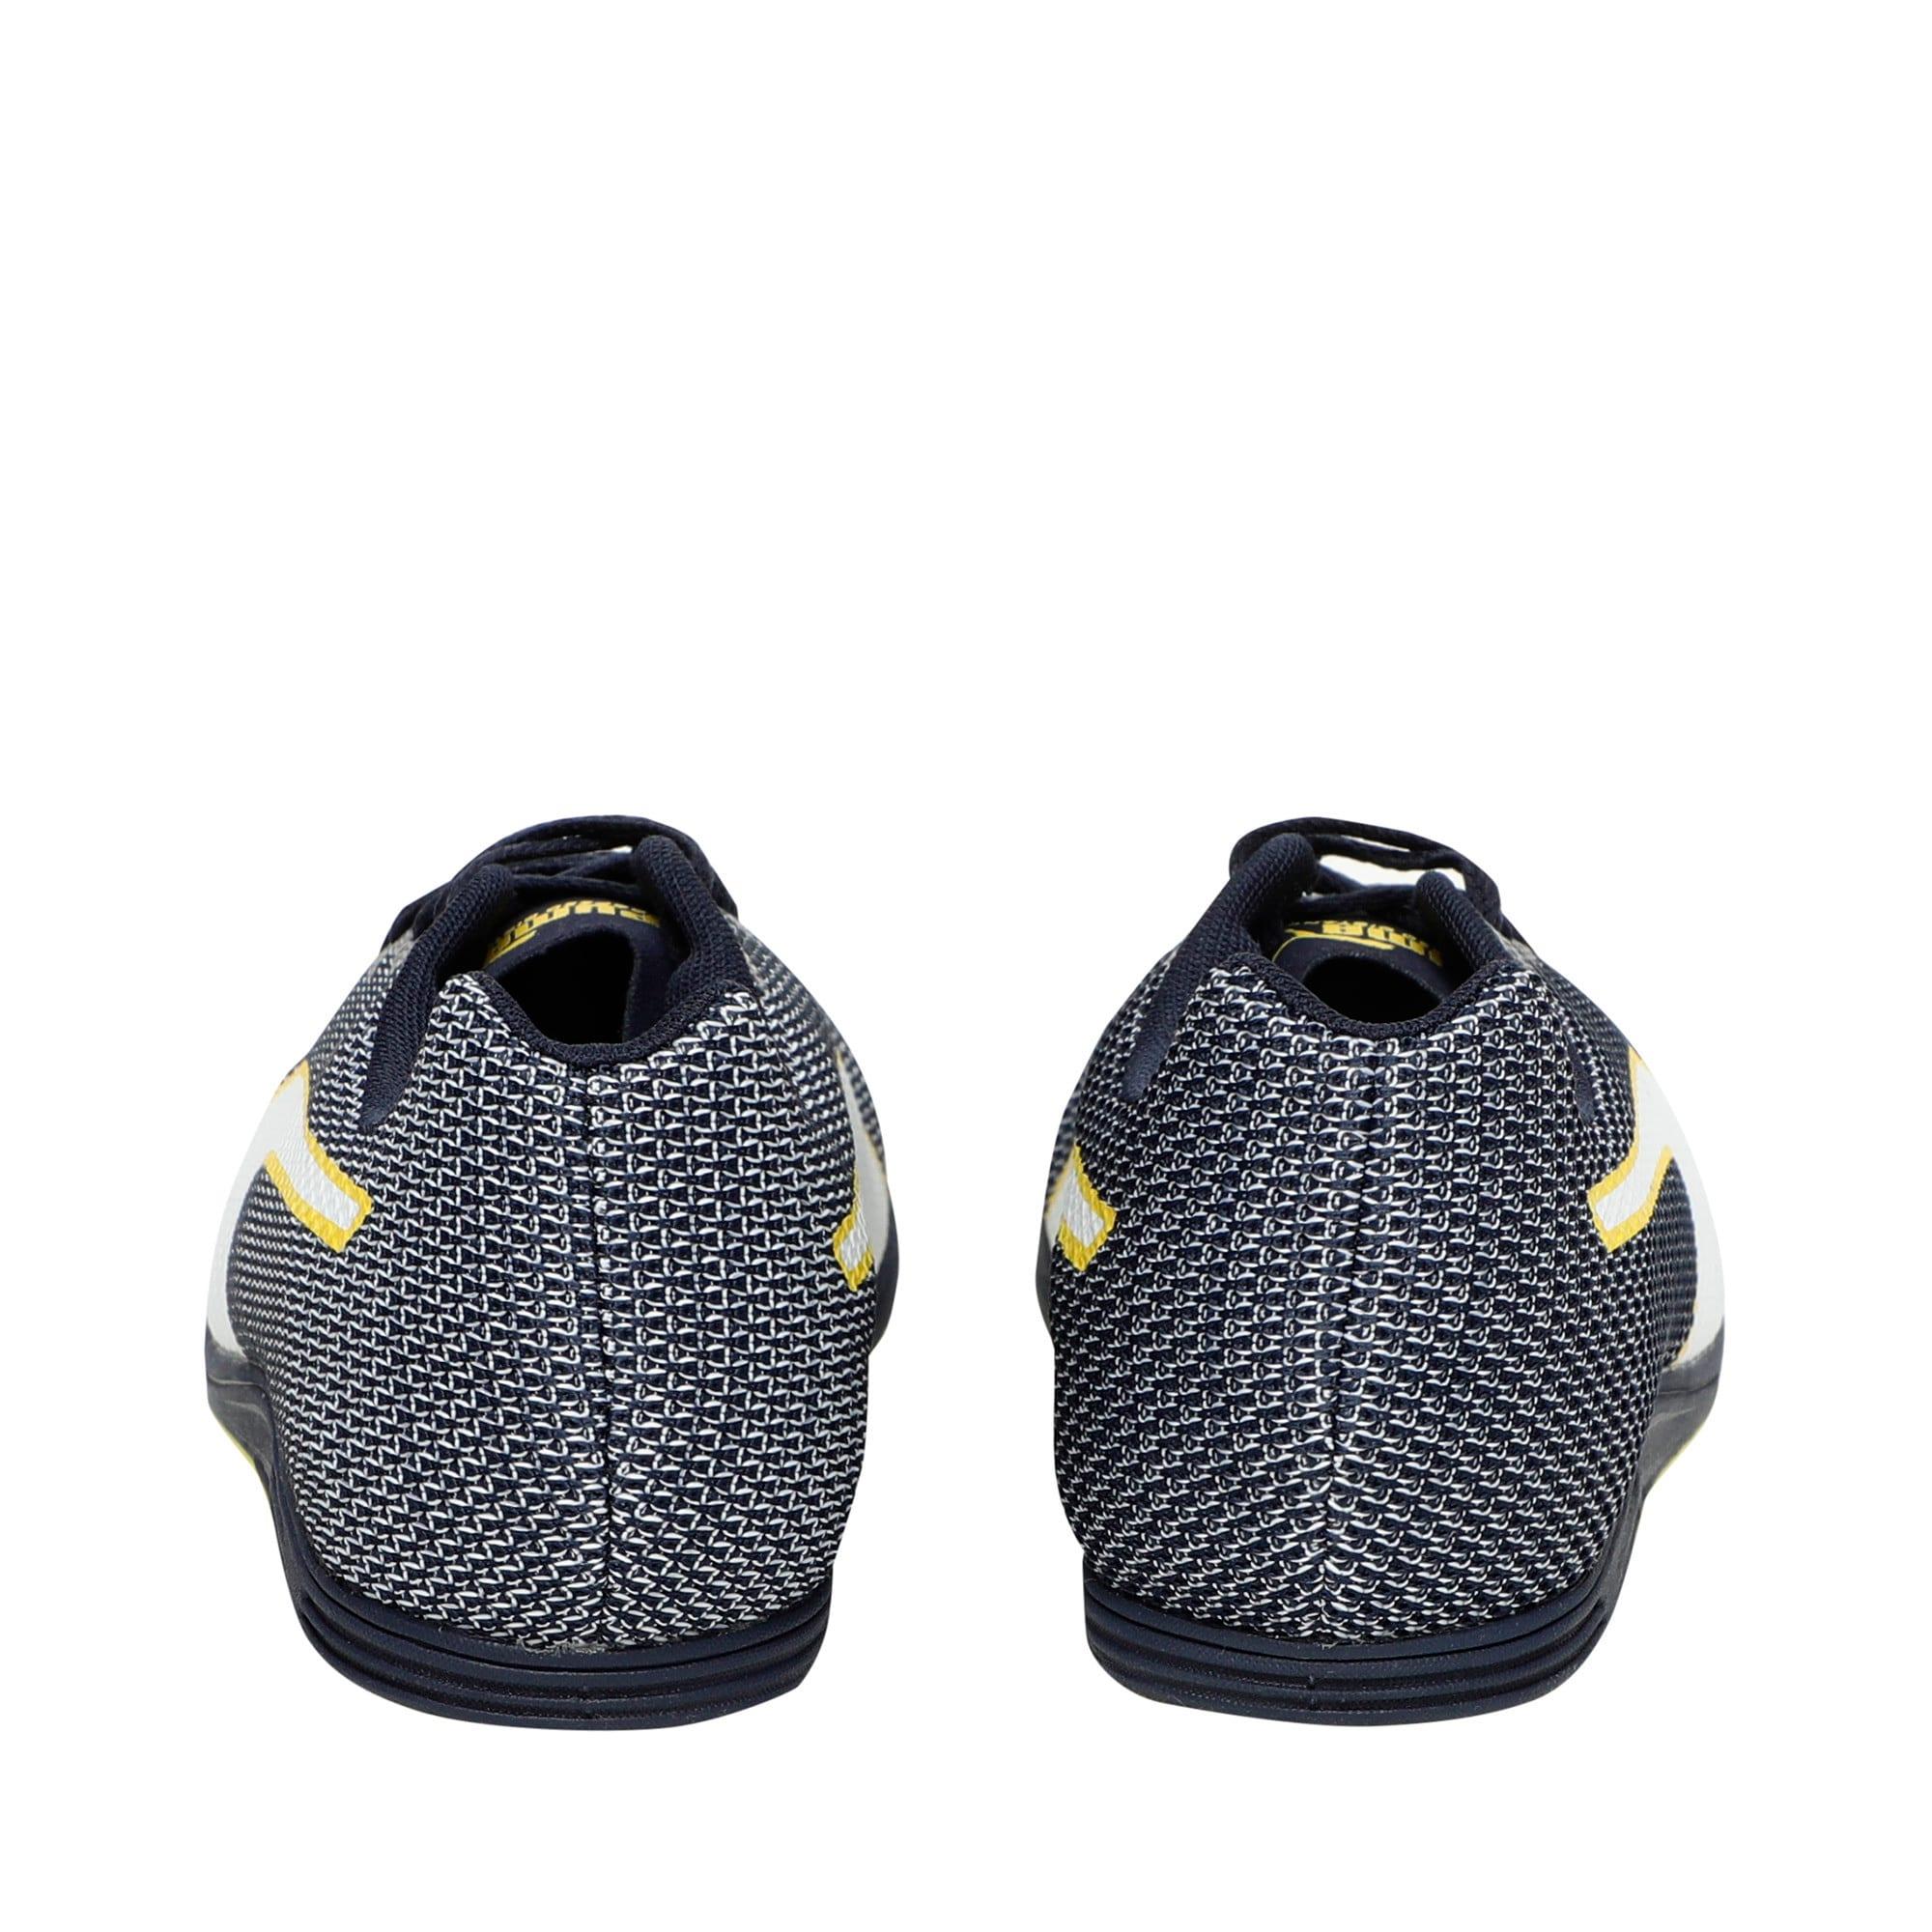 Thumbnail 4 of evoSPEED Distance 8 Men's Running Shoes, Peacoat-Blazing Yellow, medium-IND